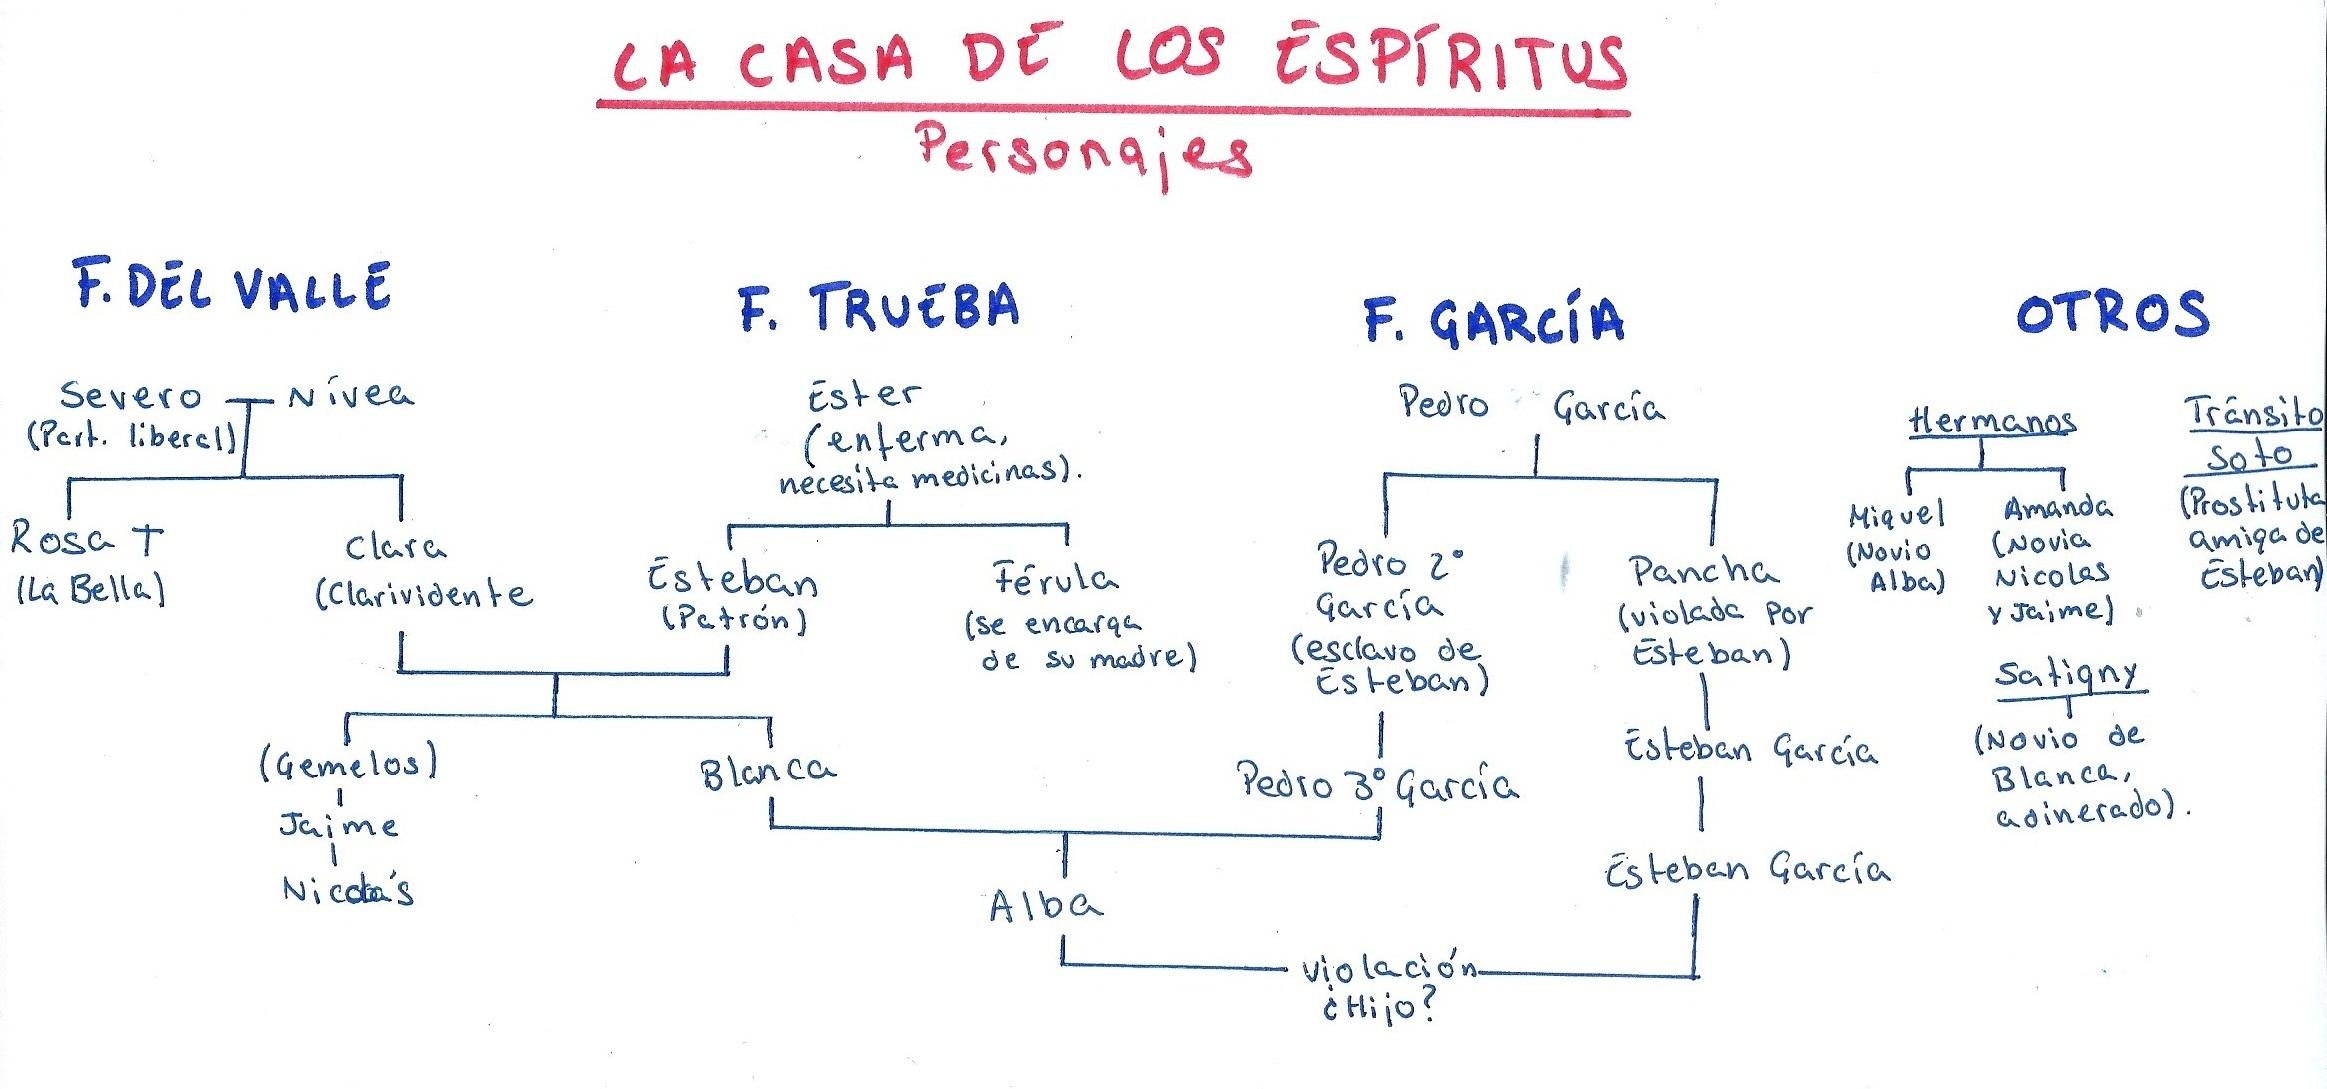 File Personajes De La Casa De Los Espiritus0001 Jpg Wikimedia Commons